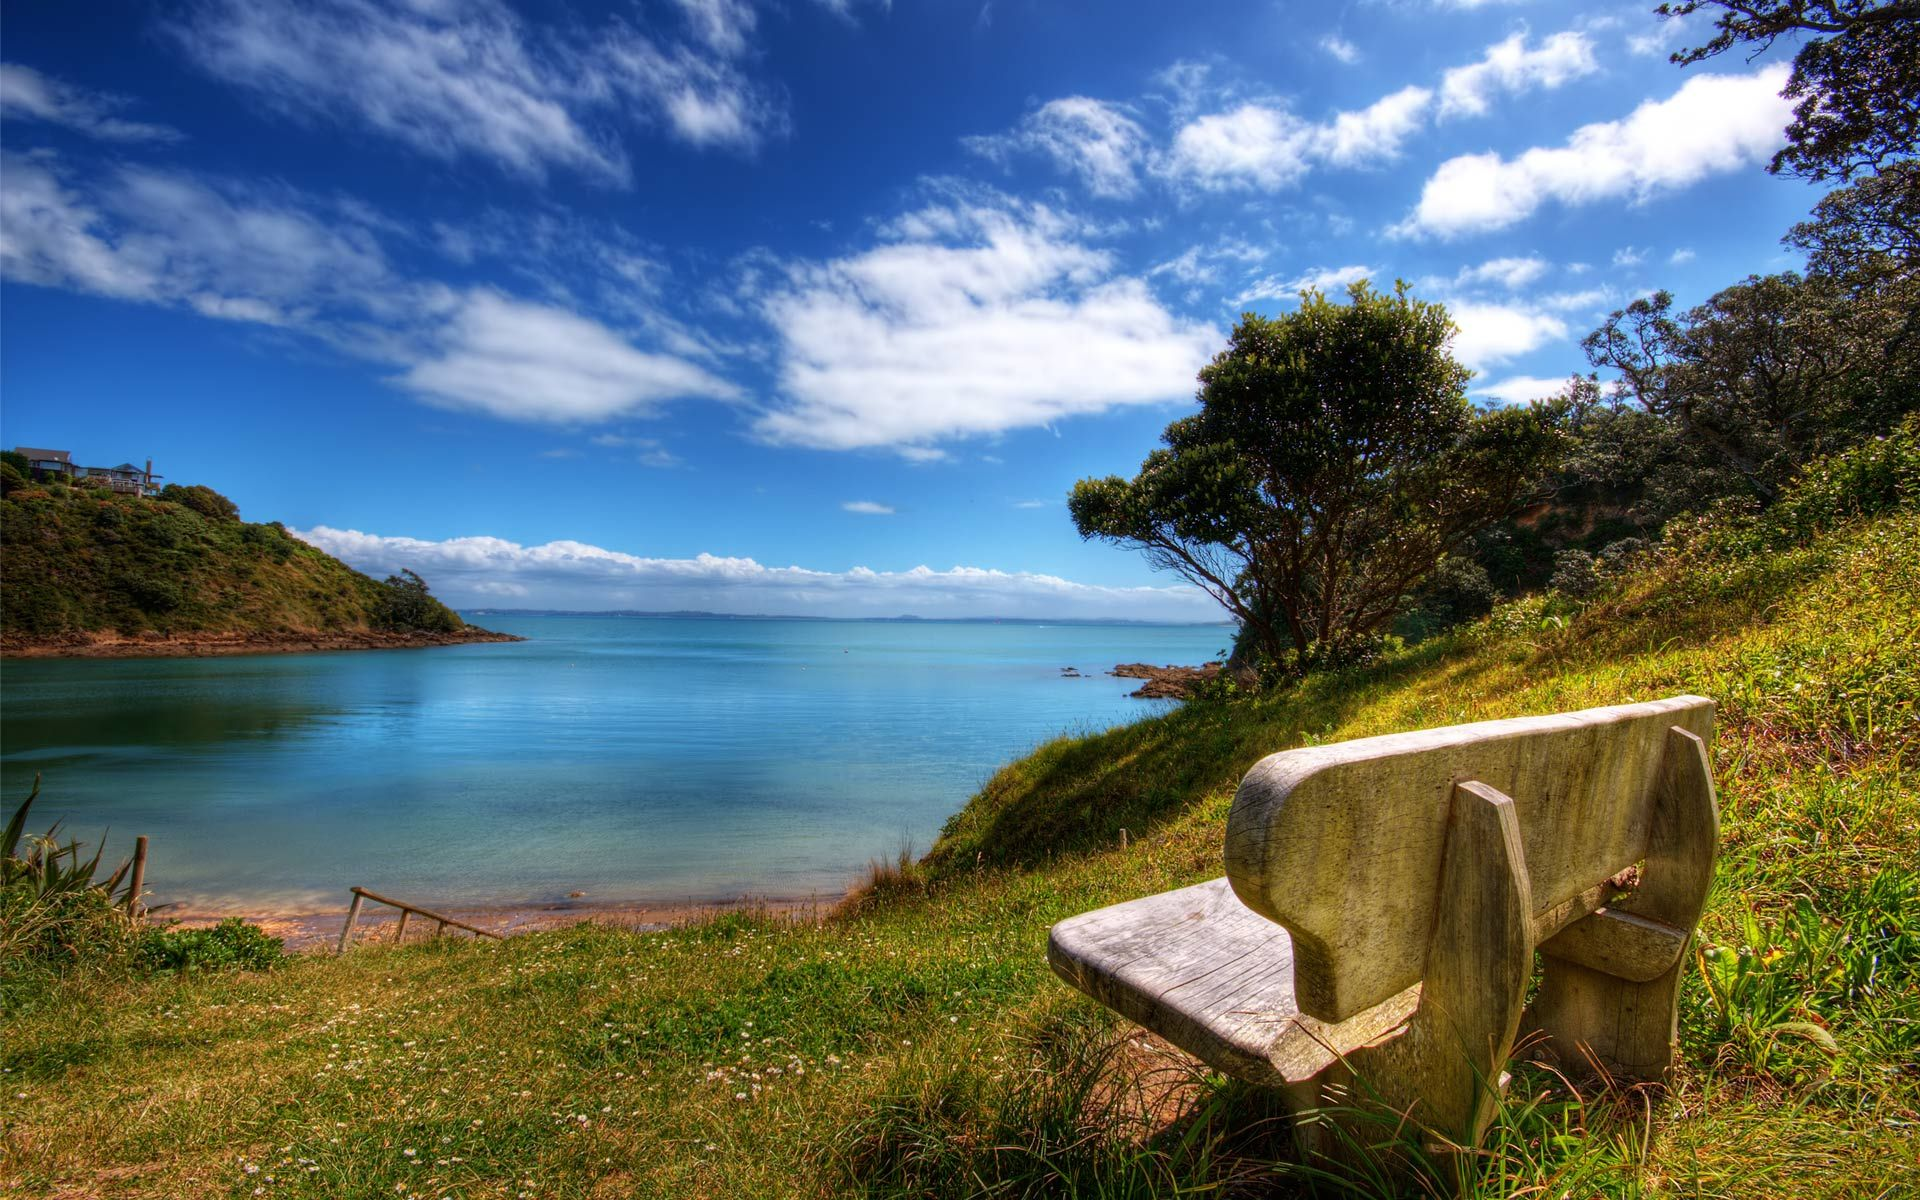 olympic national park | beach lake olympic national park washington